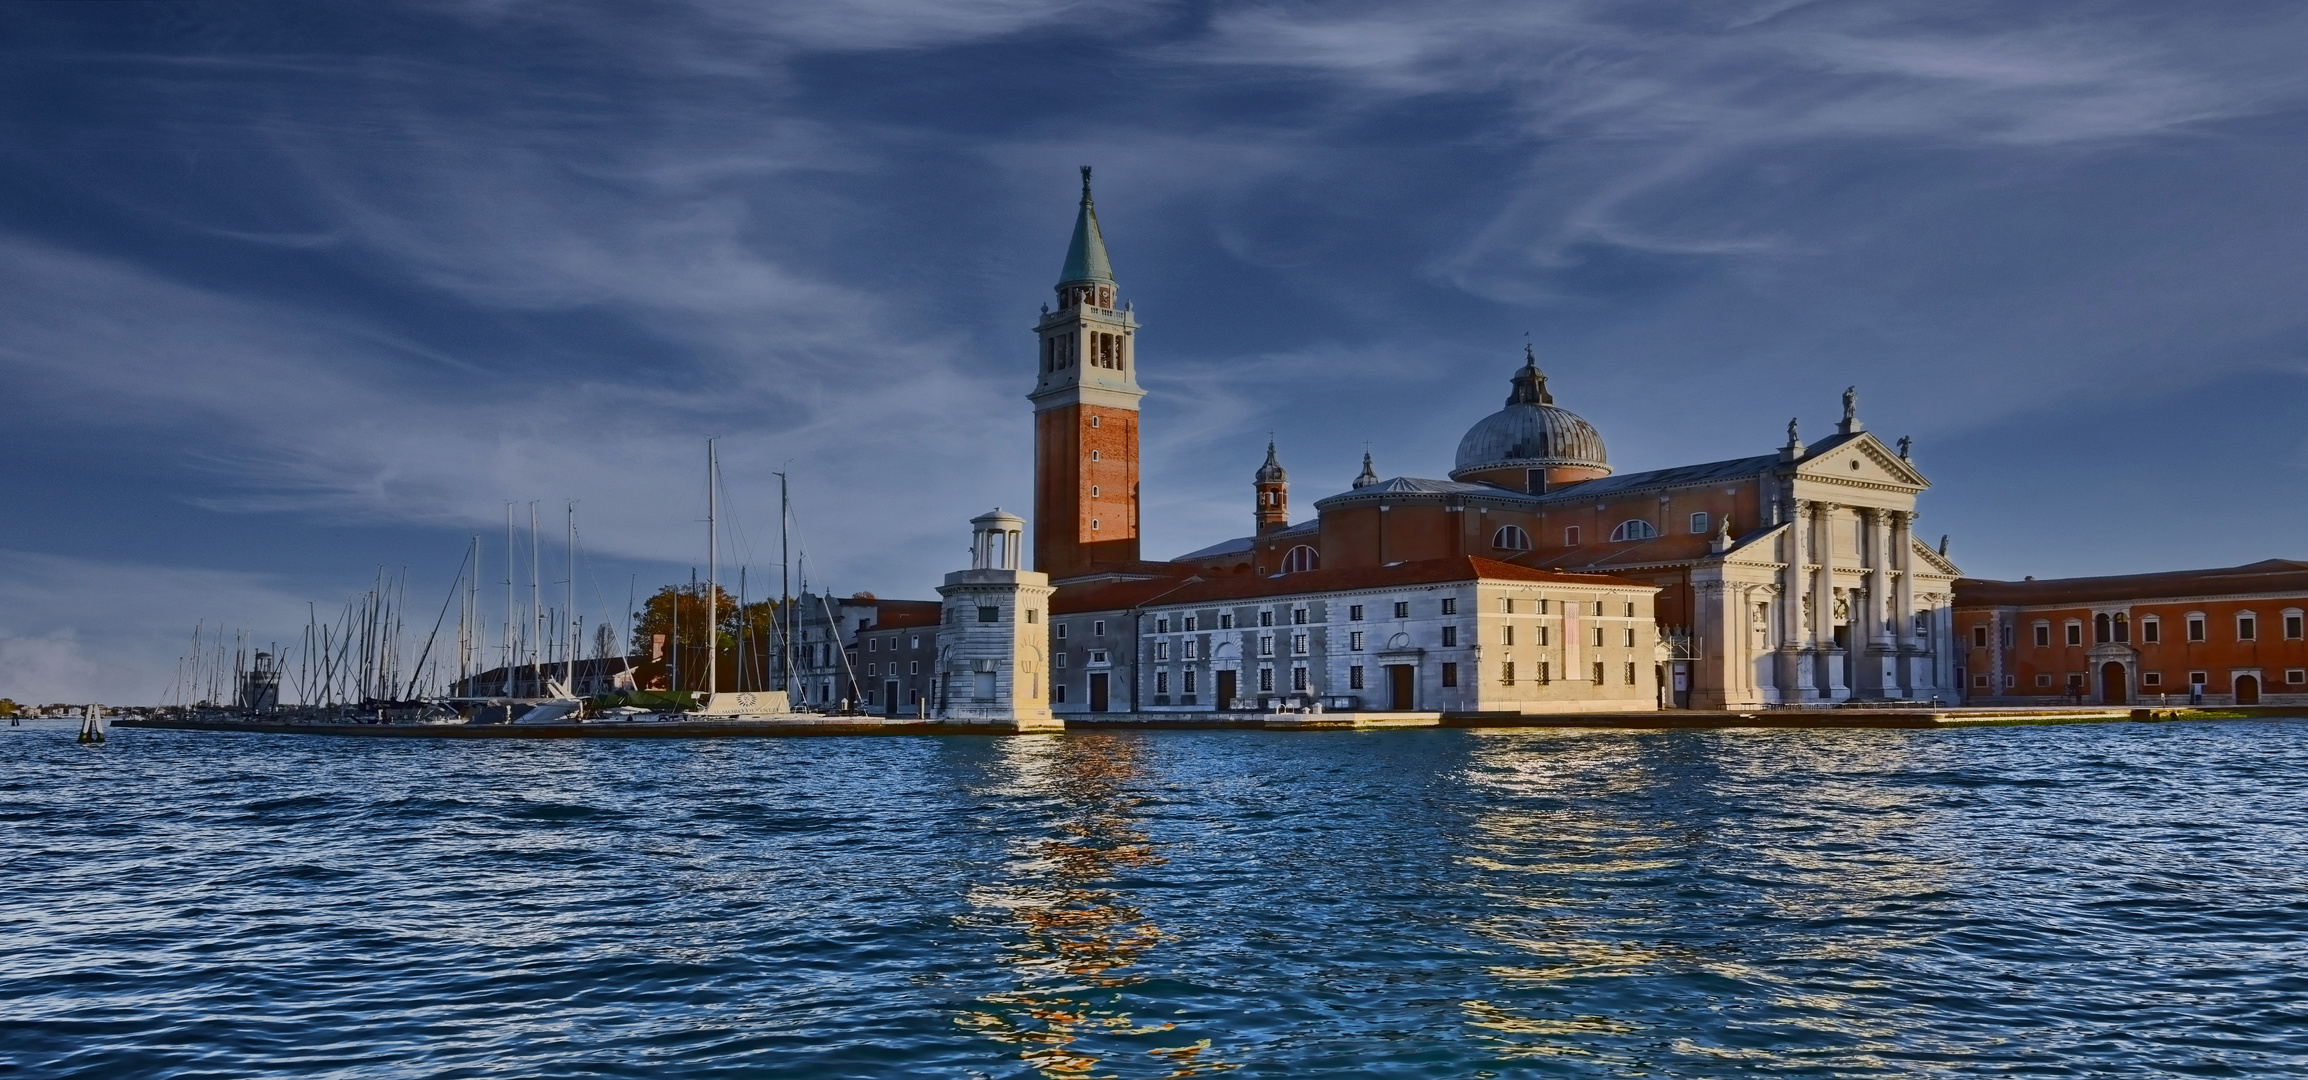 Venedig - Prachtbauten zur blauen Stunde -